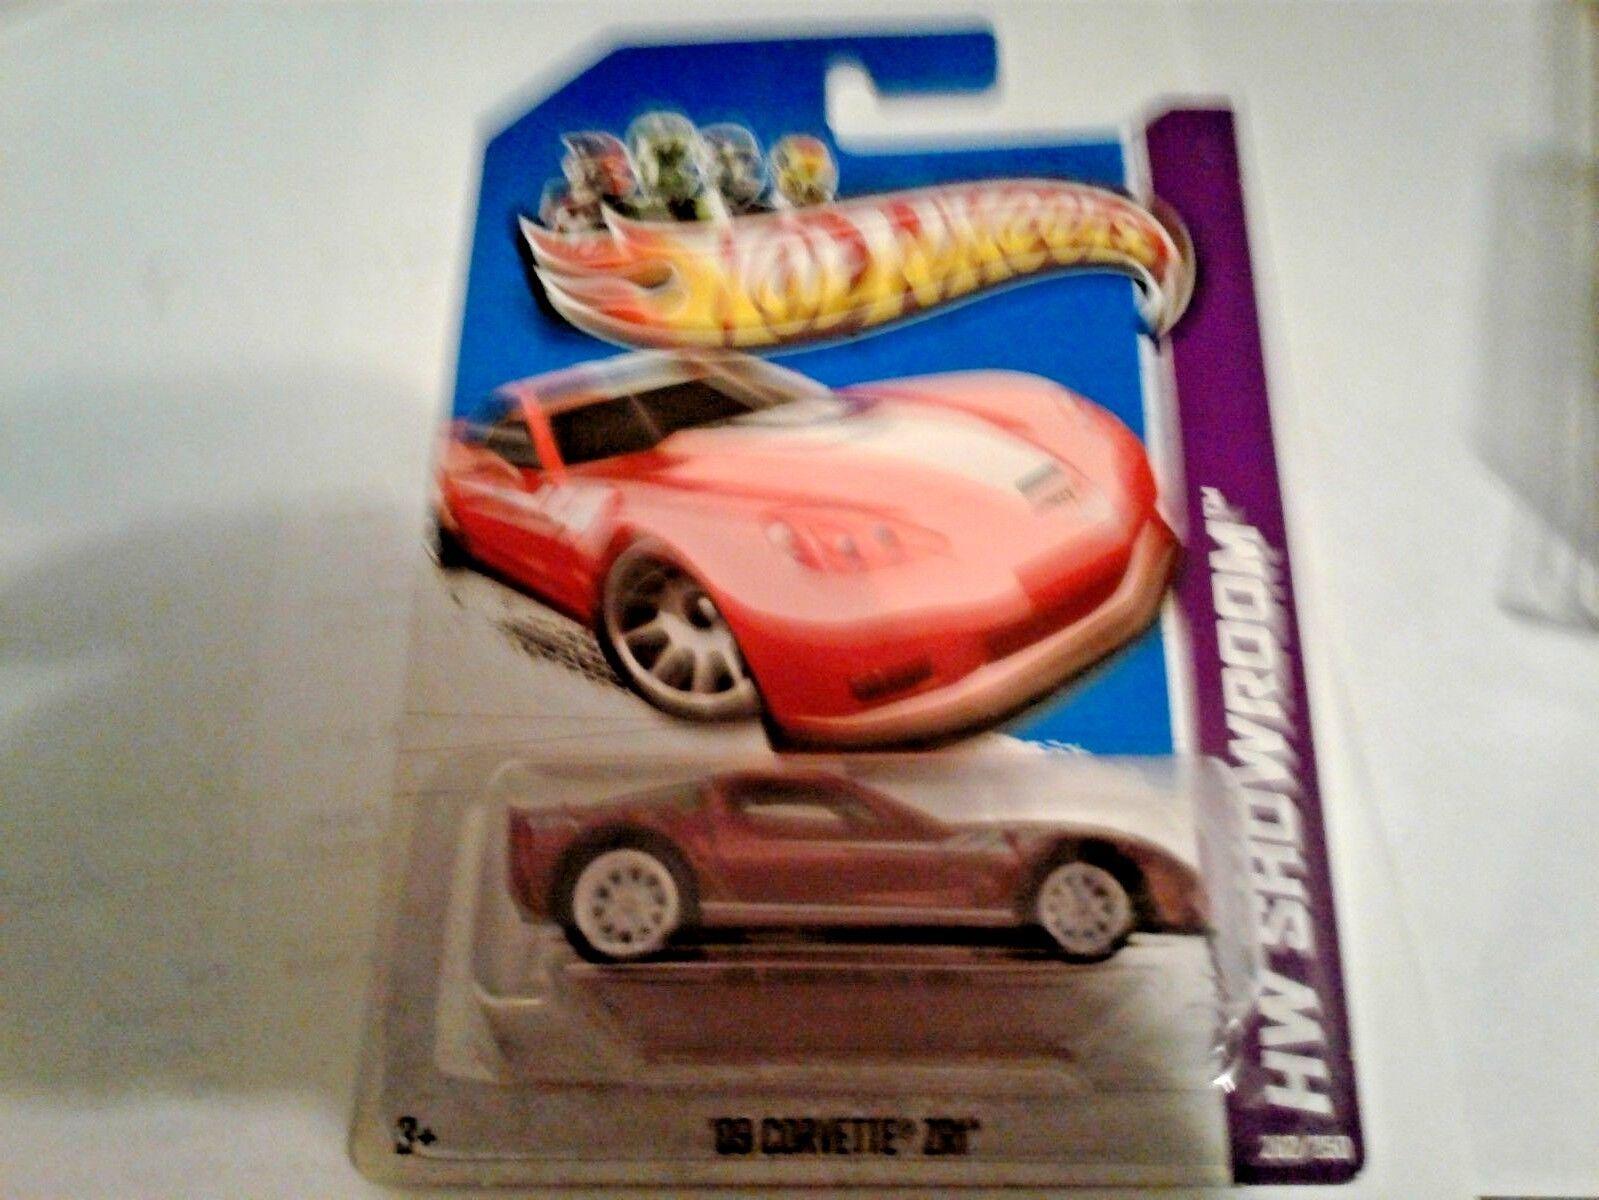 Hotwheels Hotwheels Hotwheels Super Schatzsuche 09 Corvette Zr1